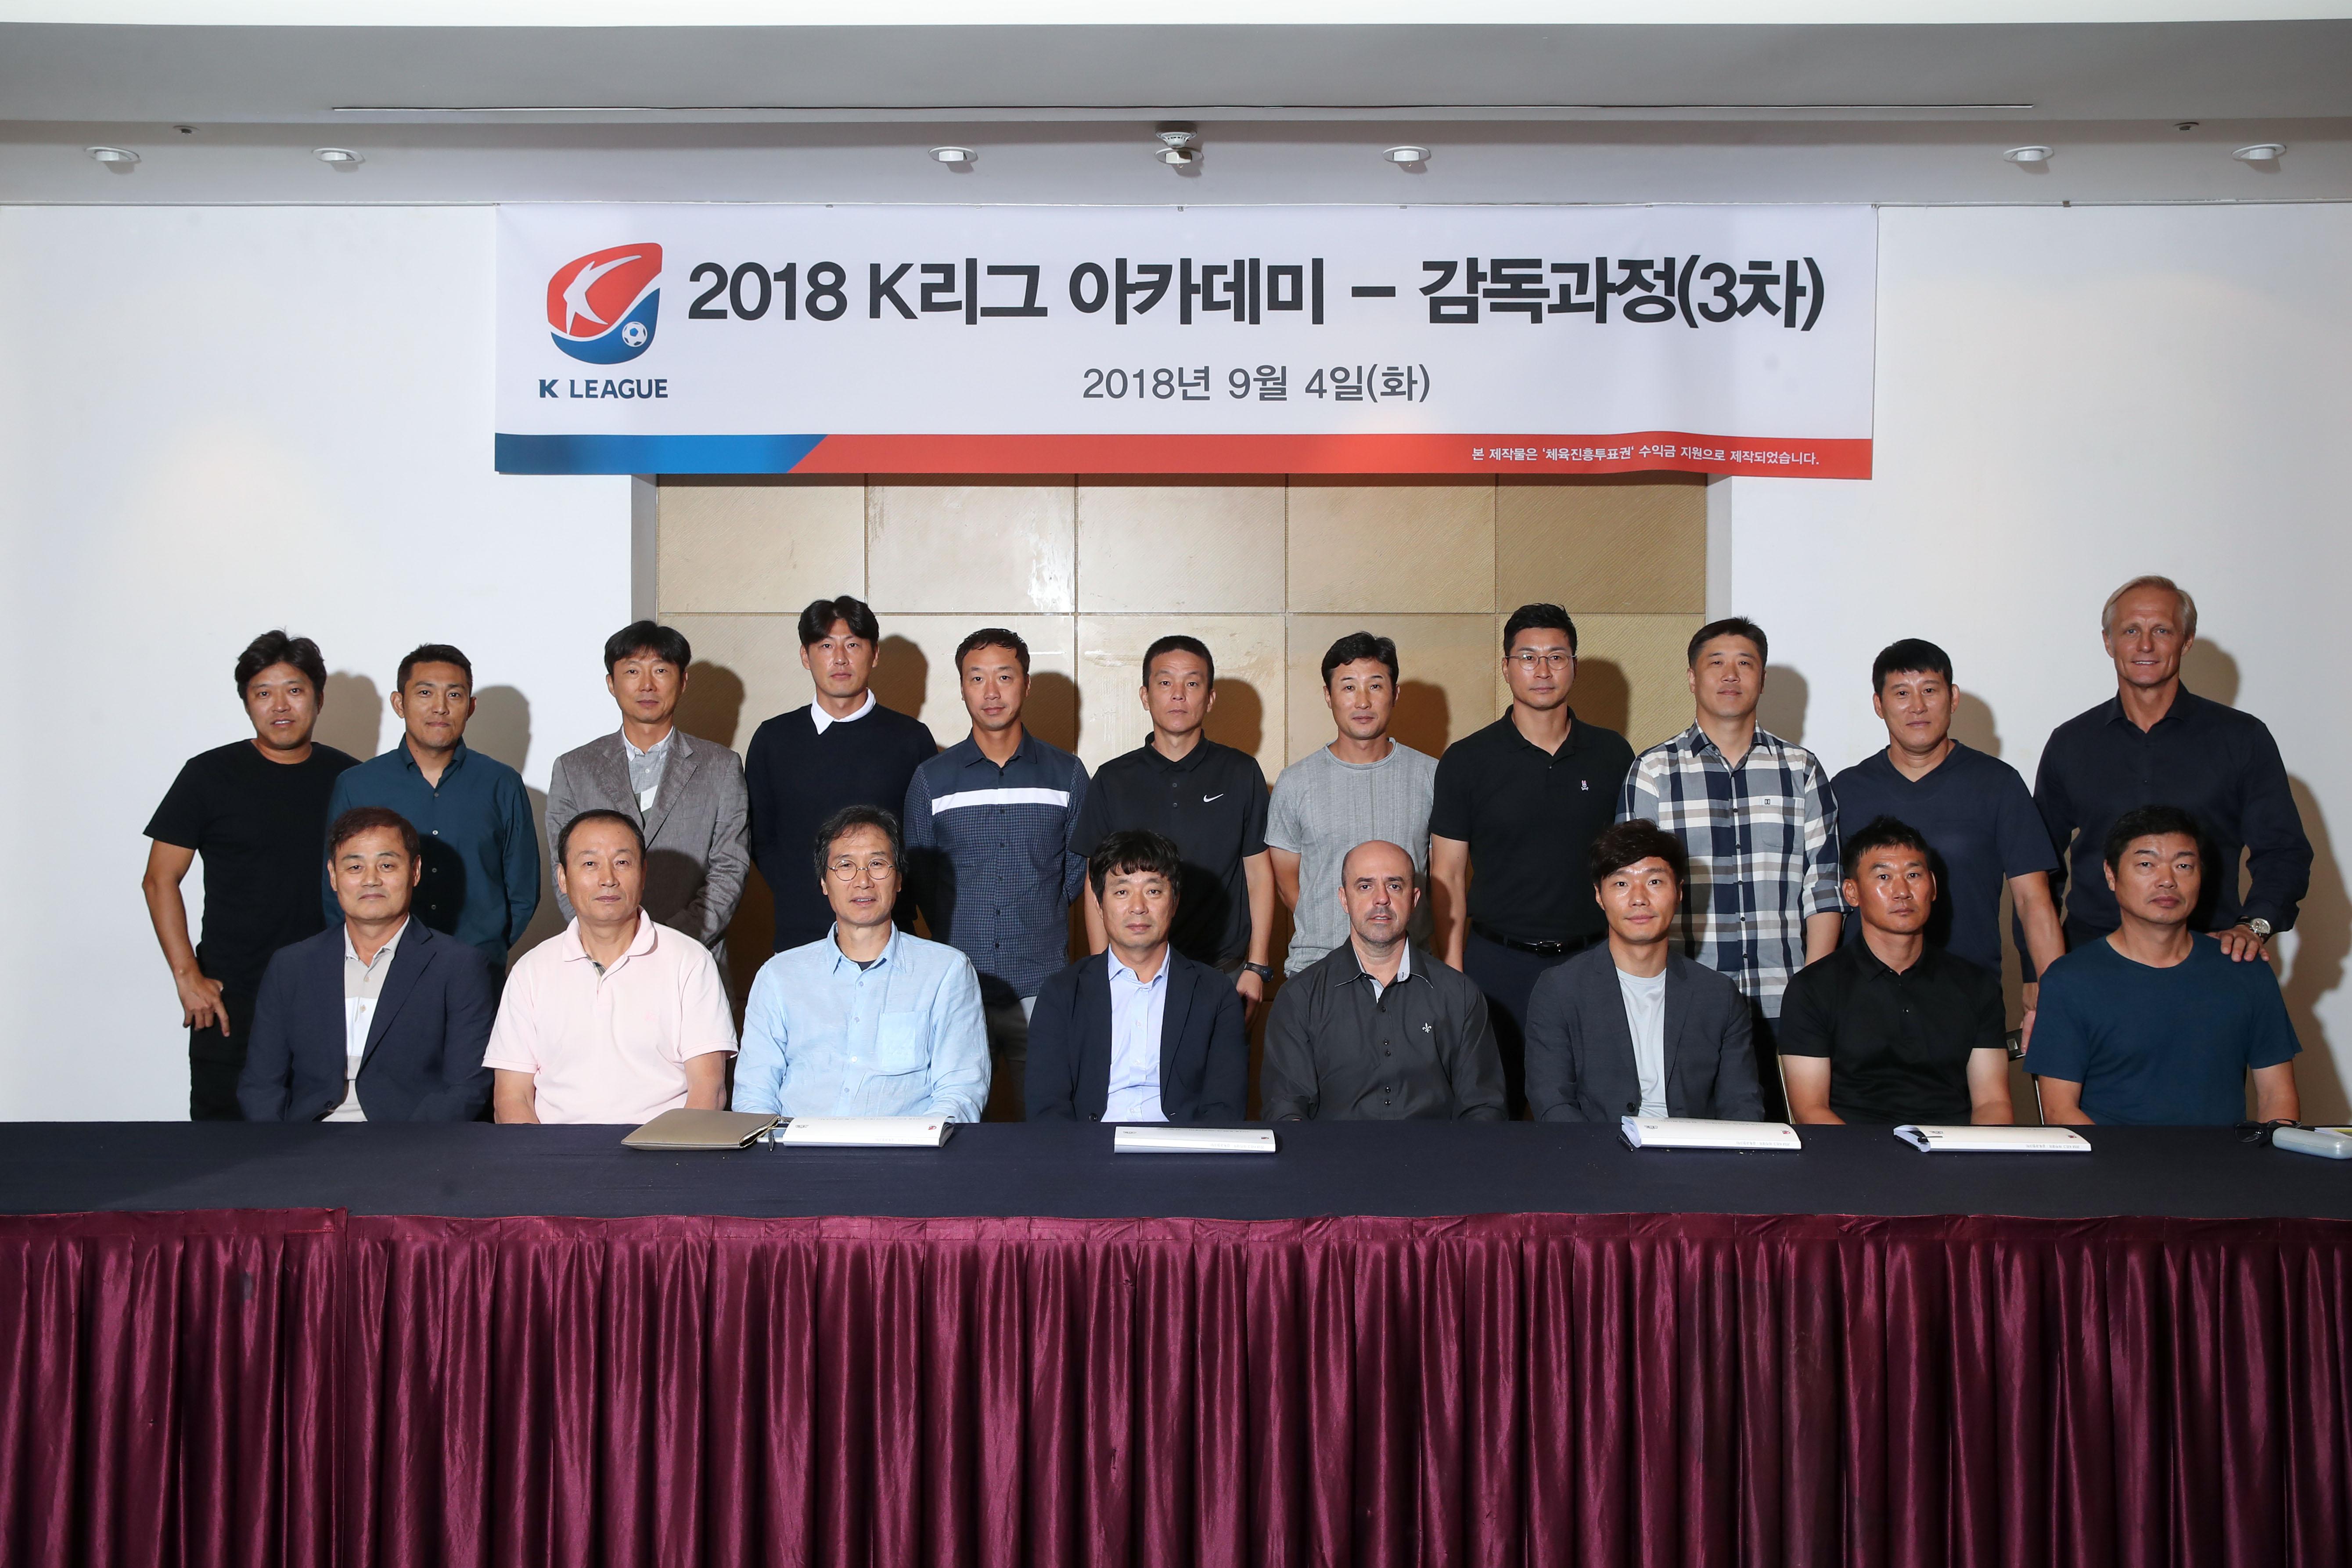 K리그 아카데미 감독과정 개최, 지휘봉 대신 펜을 든 'K리그 감독들'_이미지